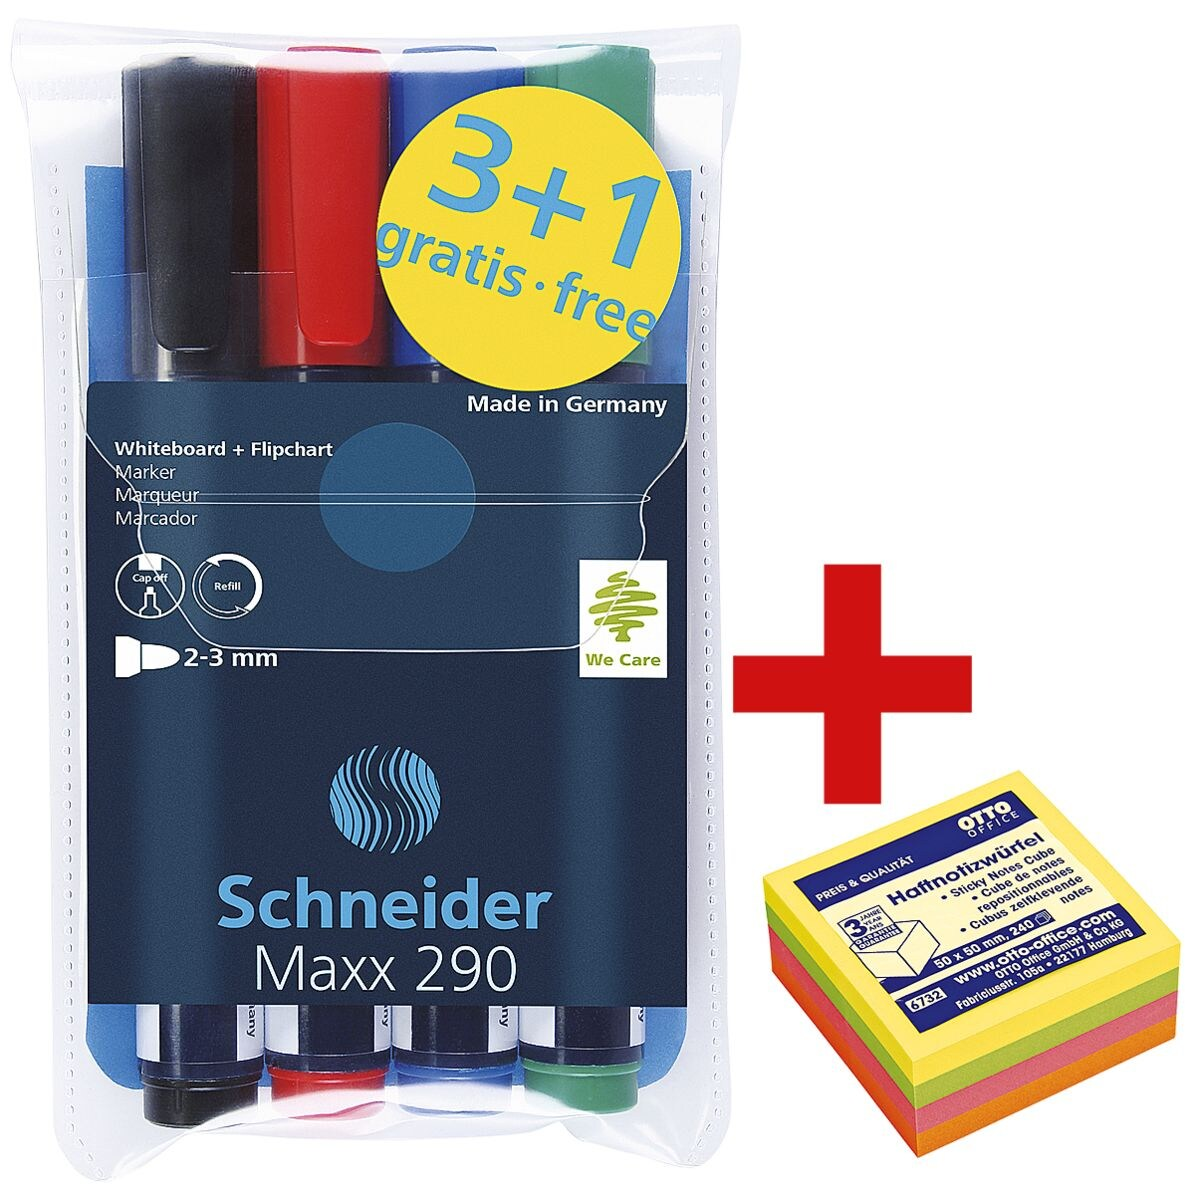 Schneider Etui met 4 whiteboard & flipchart markers »Maxx 290« incl. kubus zelfklevende notes 50x50 mm »Mini« 4 neon kleuren